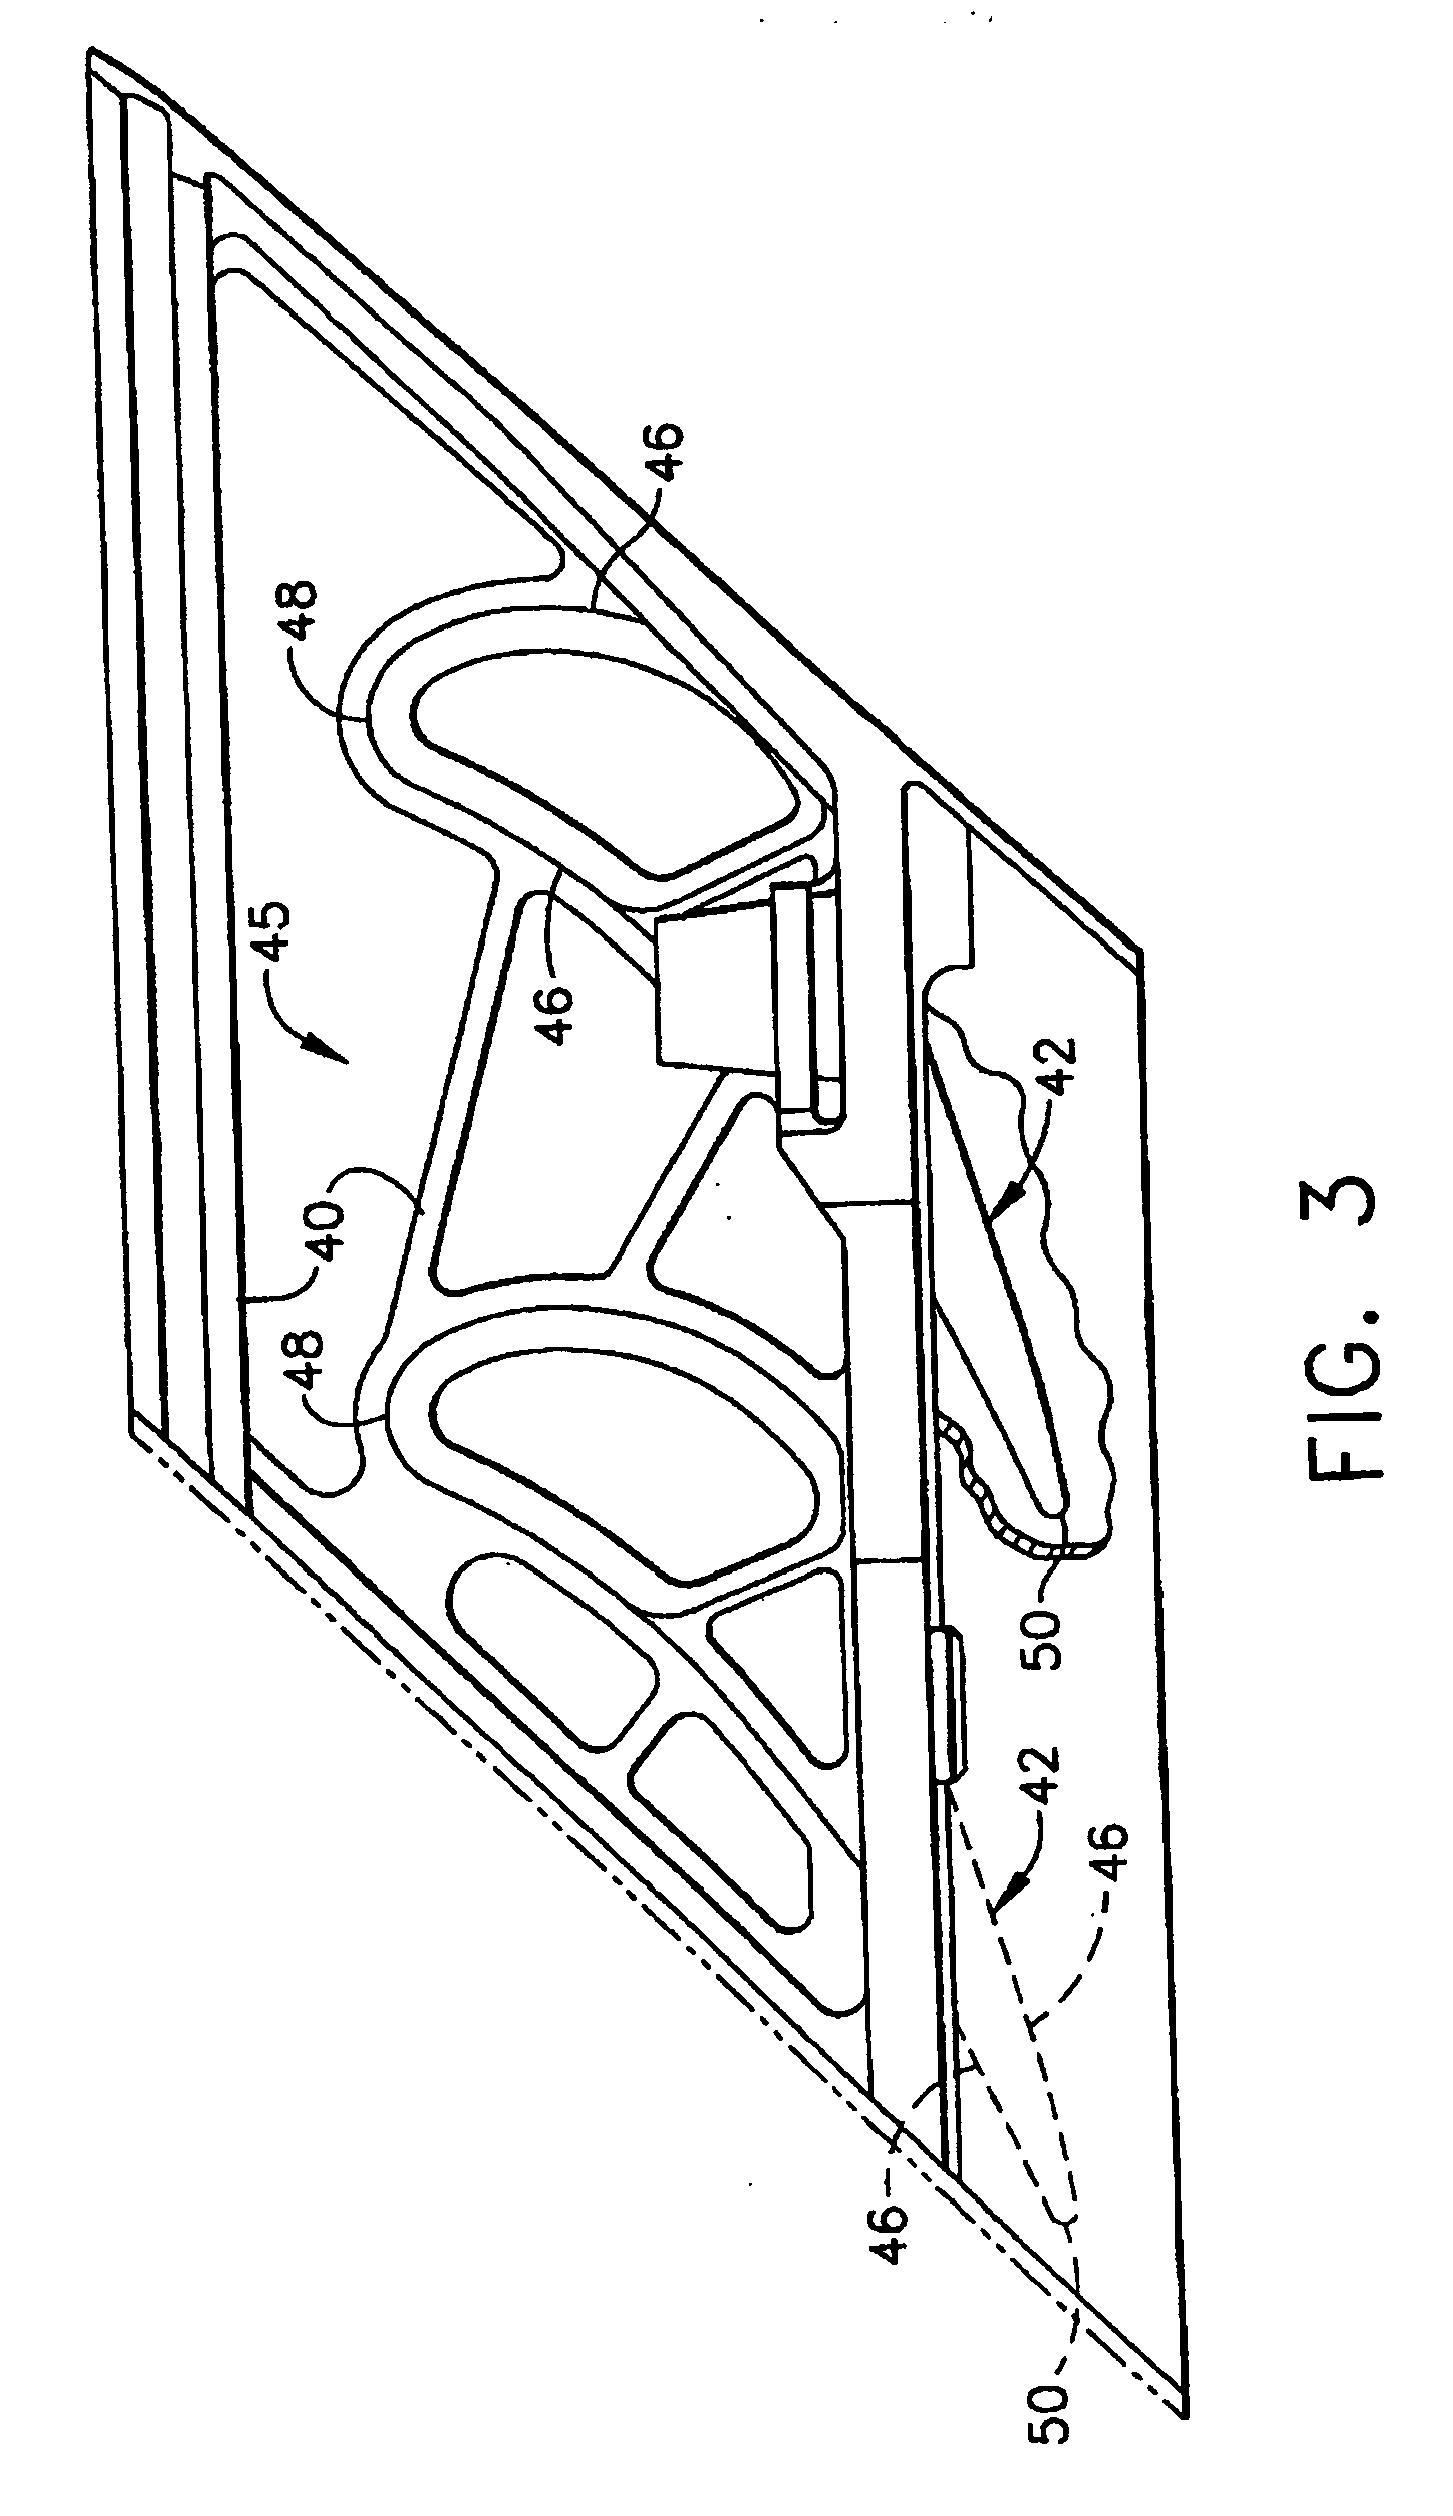 Patent EP B1 Establishing a throat area of a gas turbine